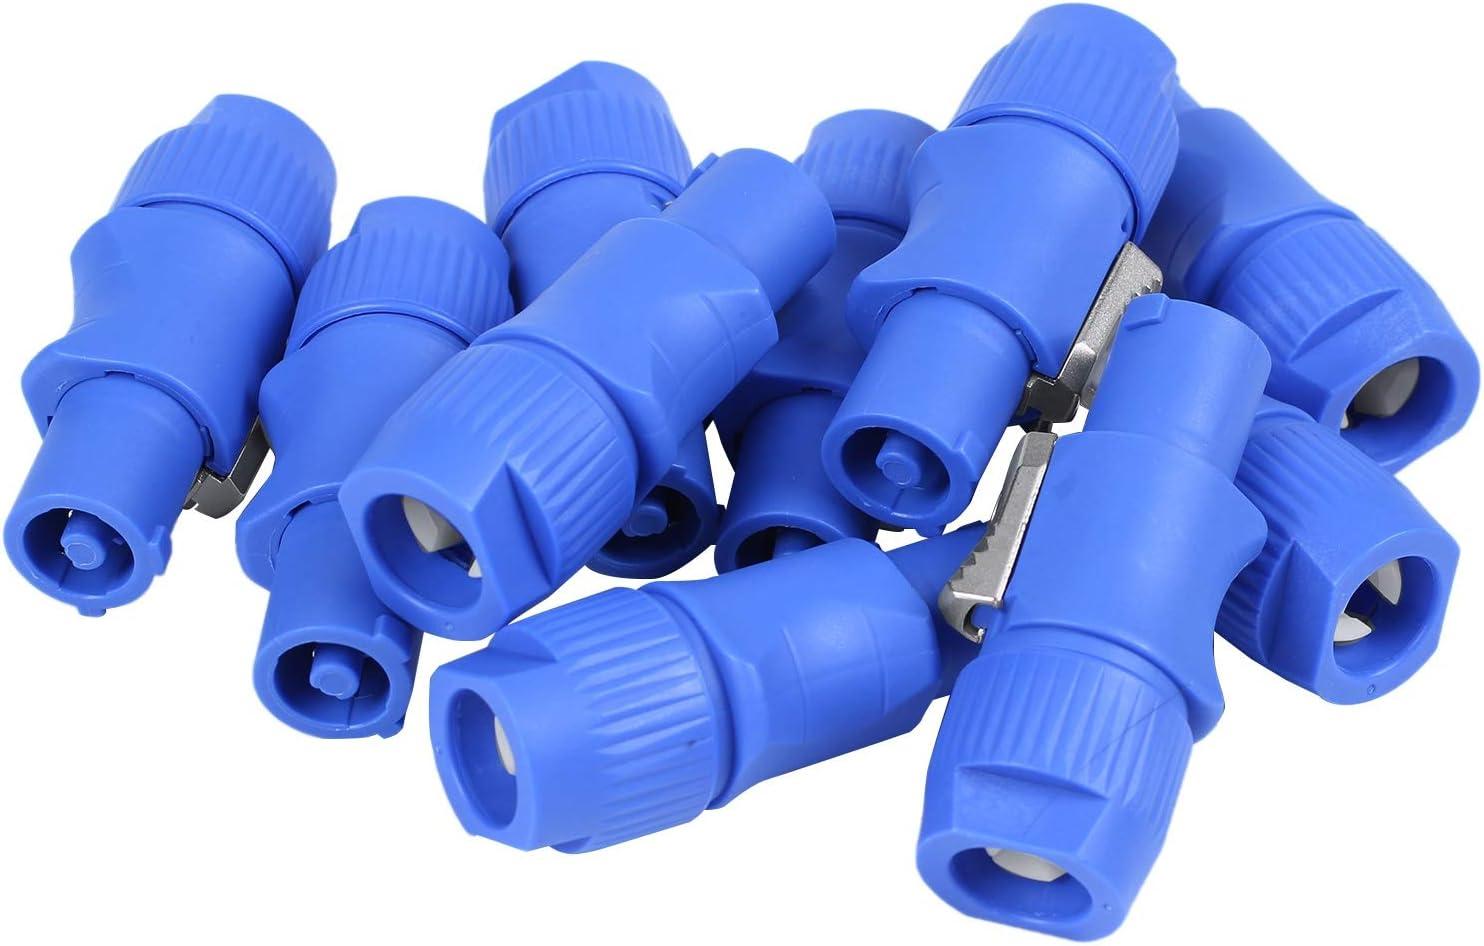 Kuinayouyi 10Pcs//Lot Nac3Fca Speakon Plug 3 Pin Male Powercon 20A 250V Ac Power Plug Blue